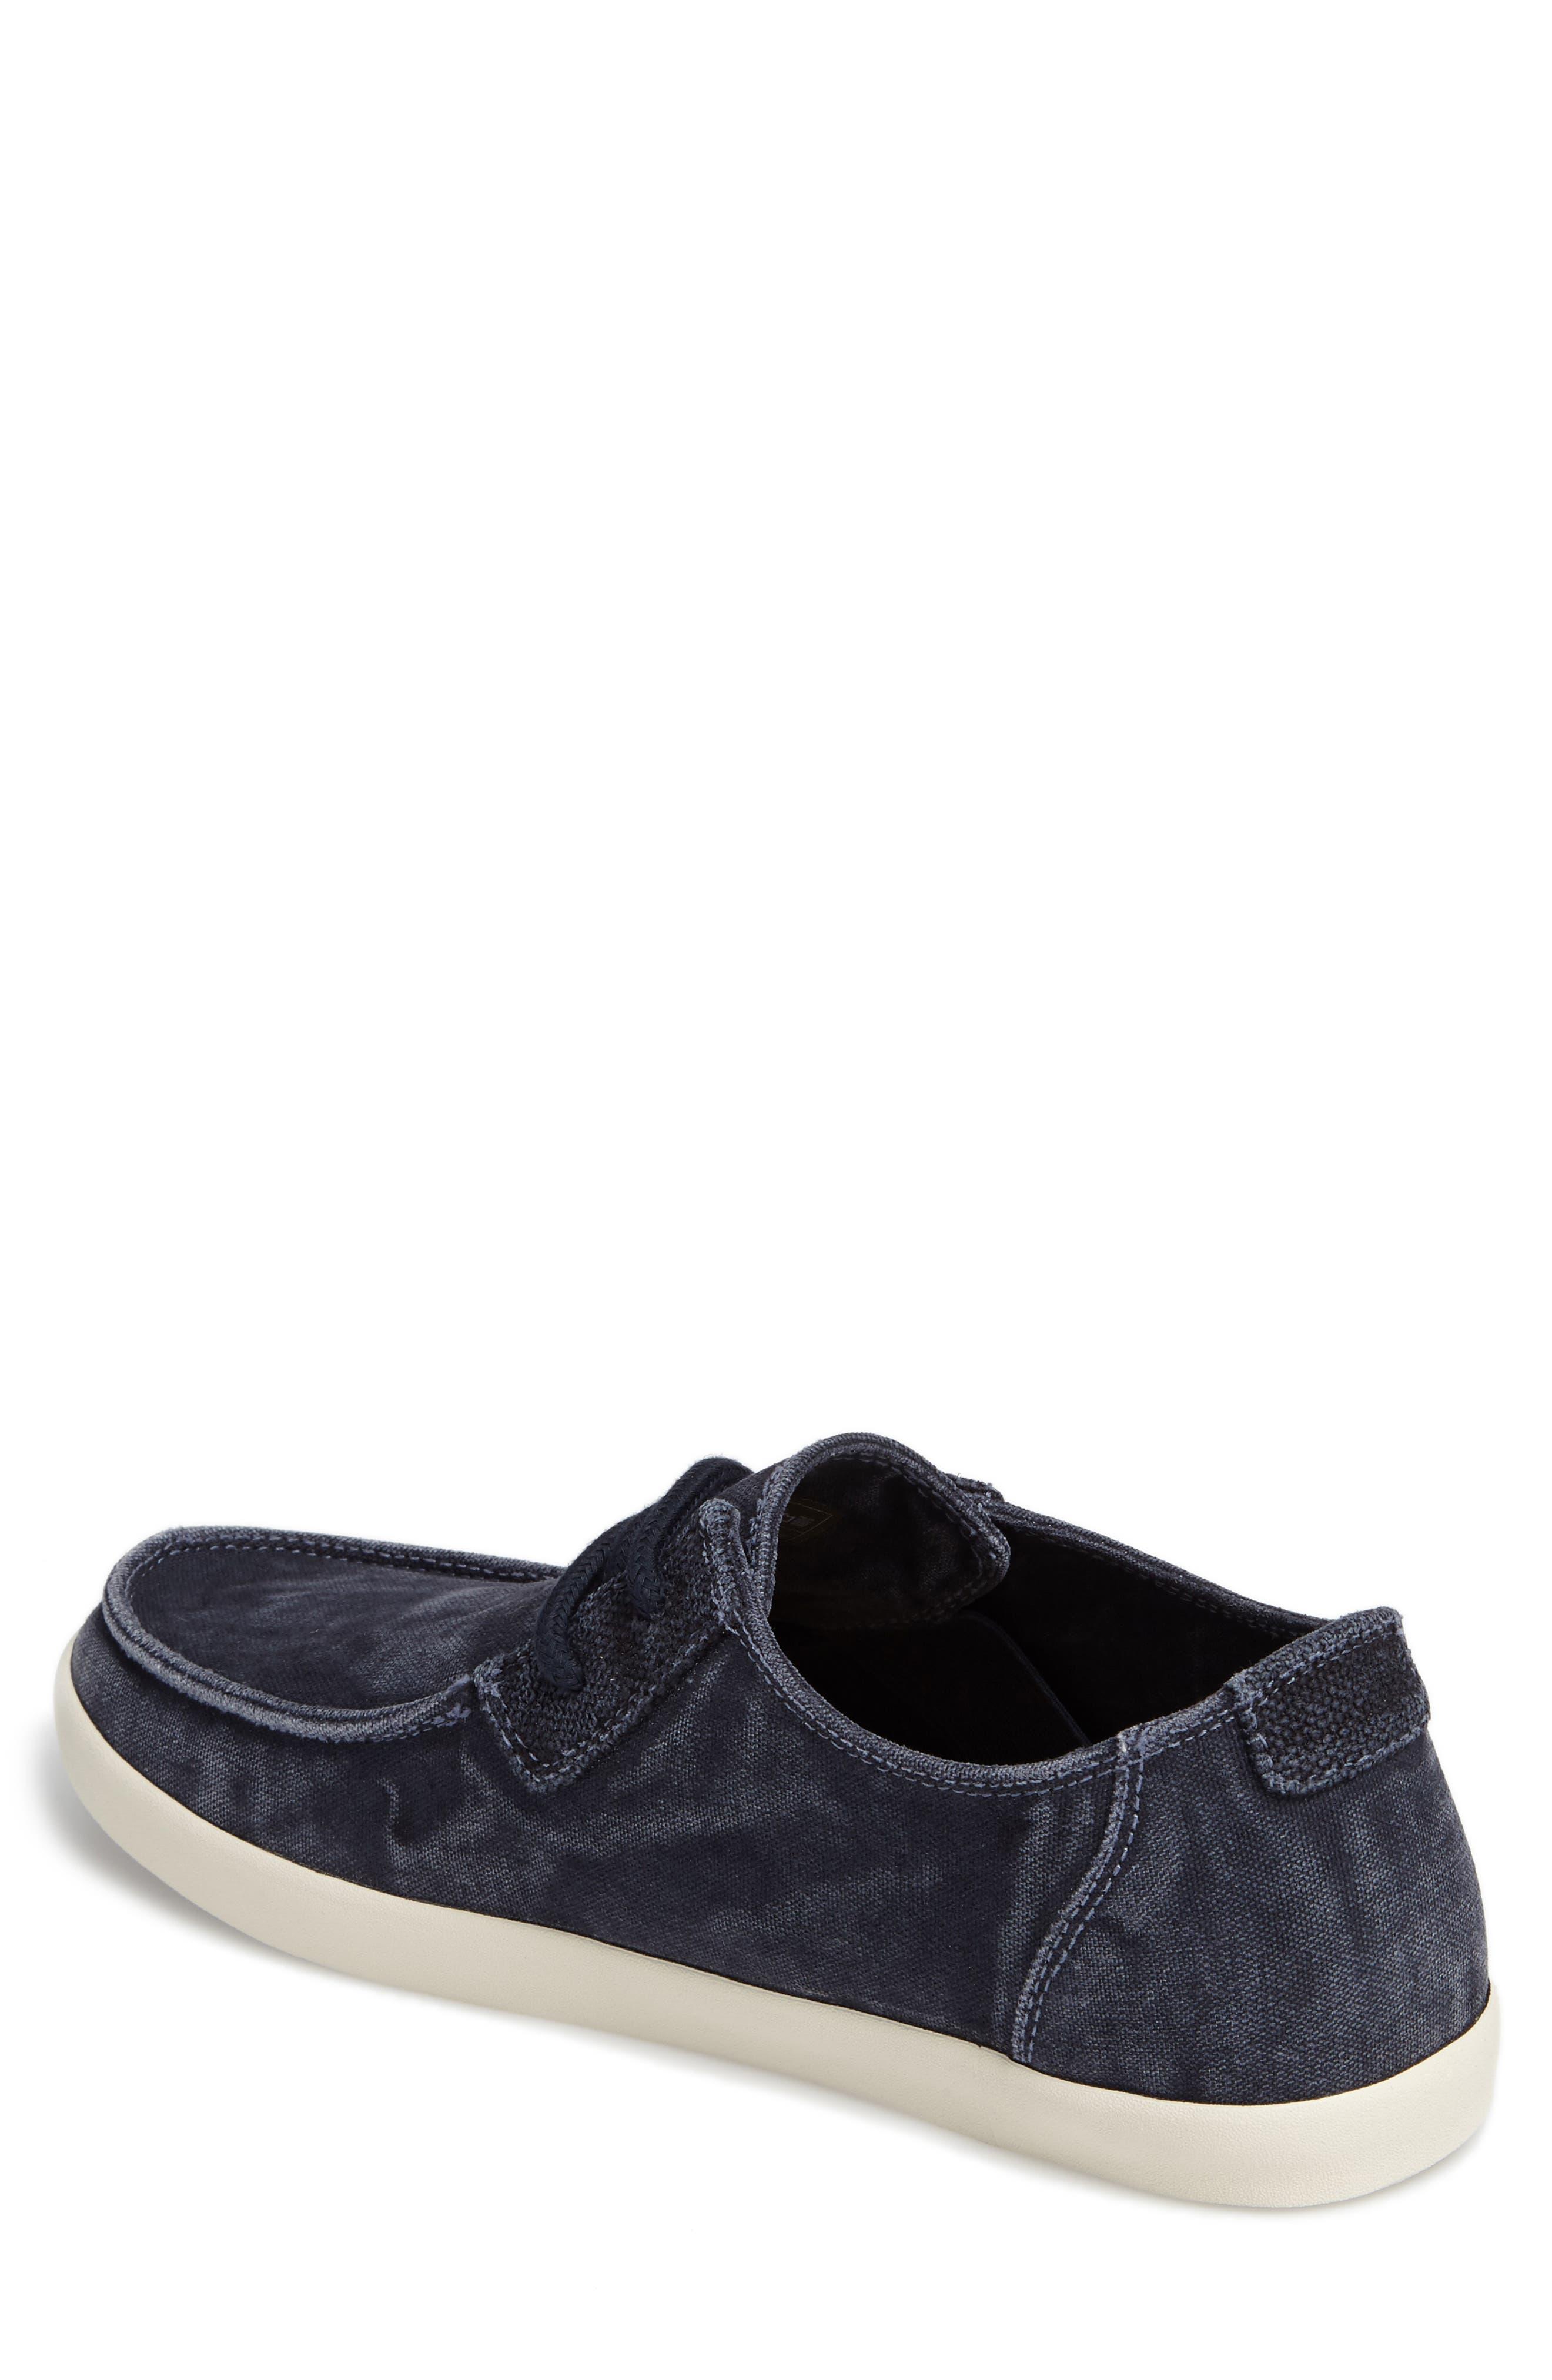 Alternate Image 2  - Sanuk Numami Sneaker (Men)